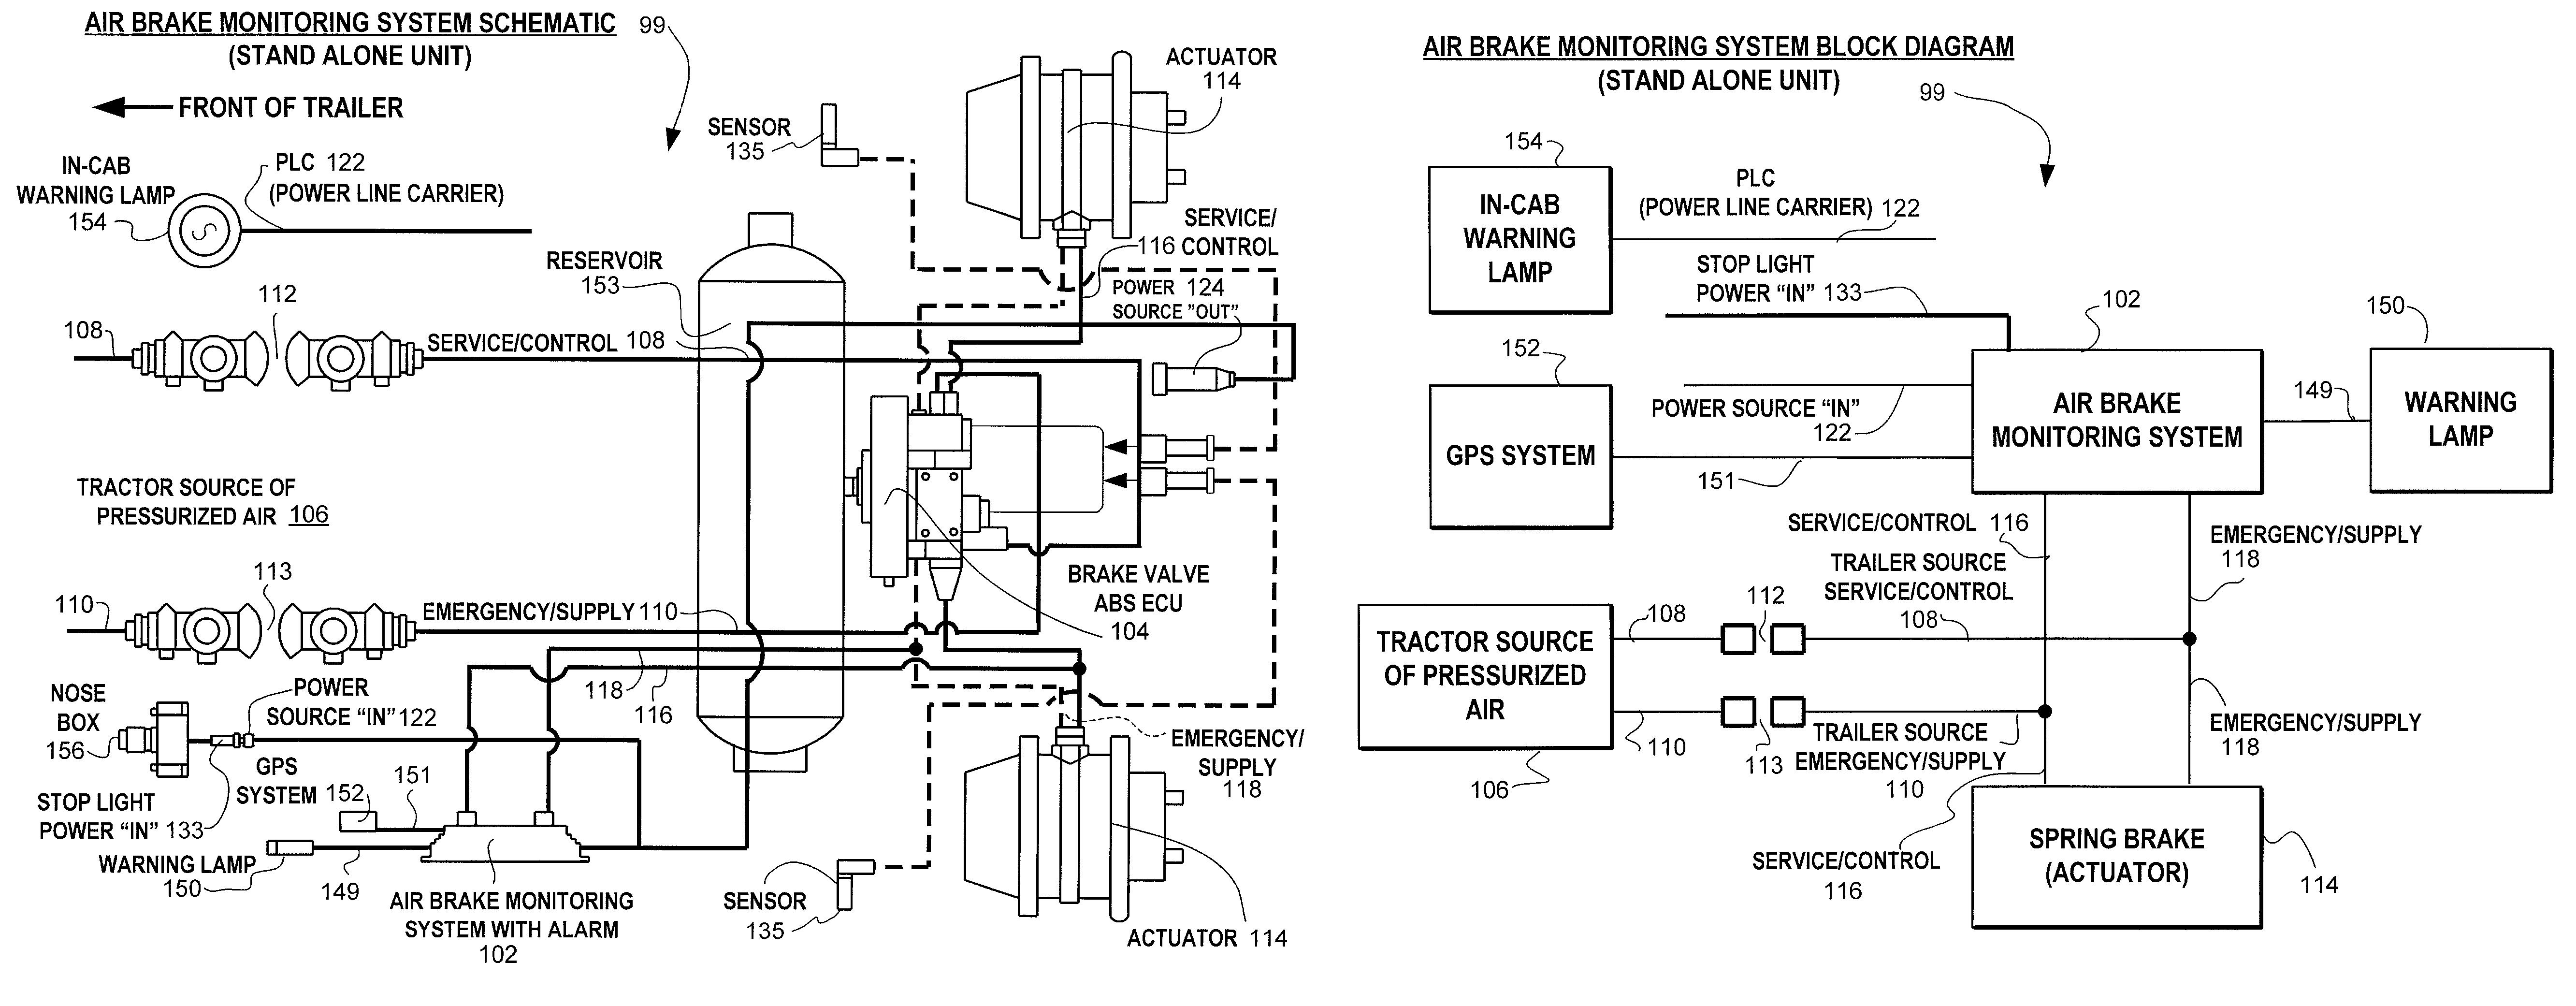 pneumatic semi trailer air bag schematic freightliner wabco abs brake module wiring diagram  freightliner wabco abs brake module wiring diagram